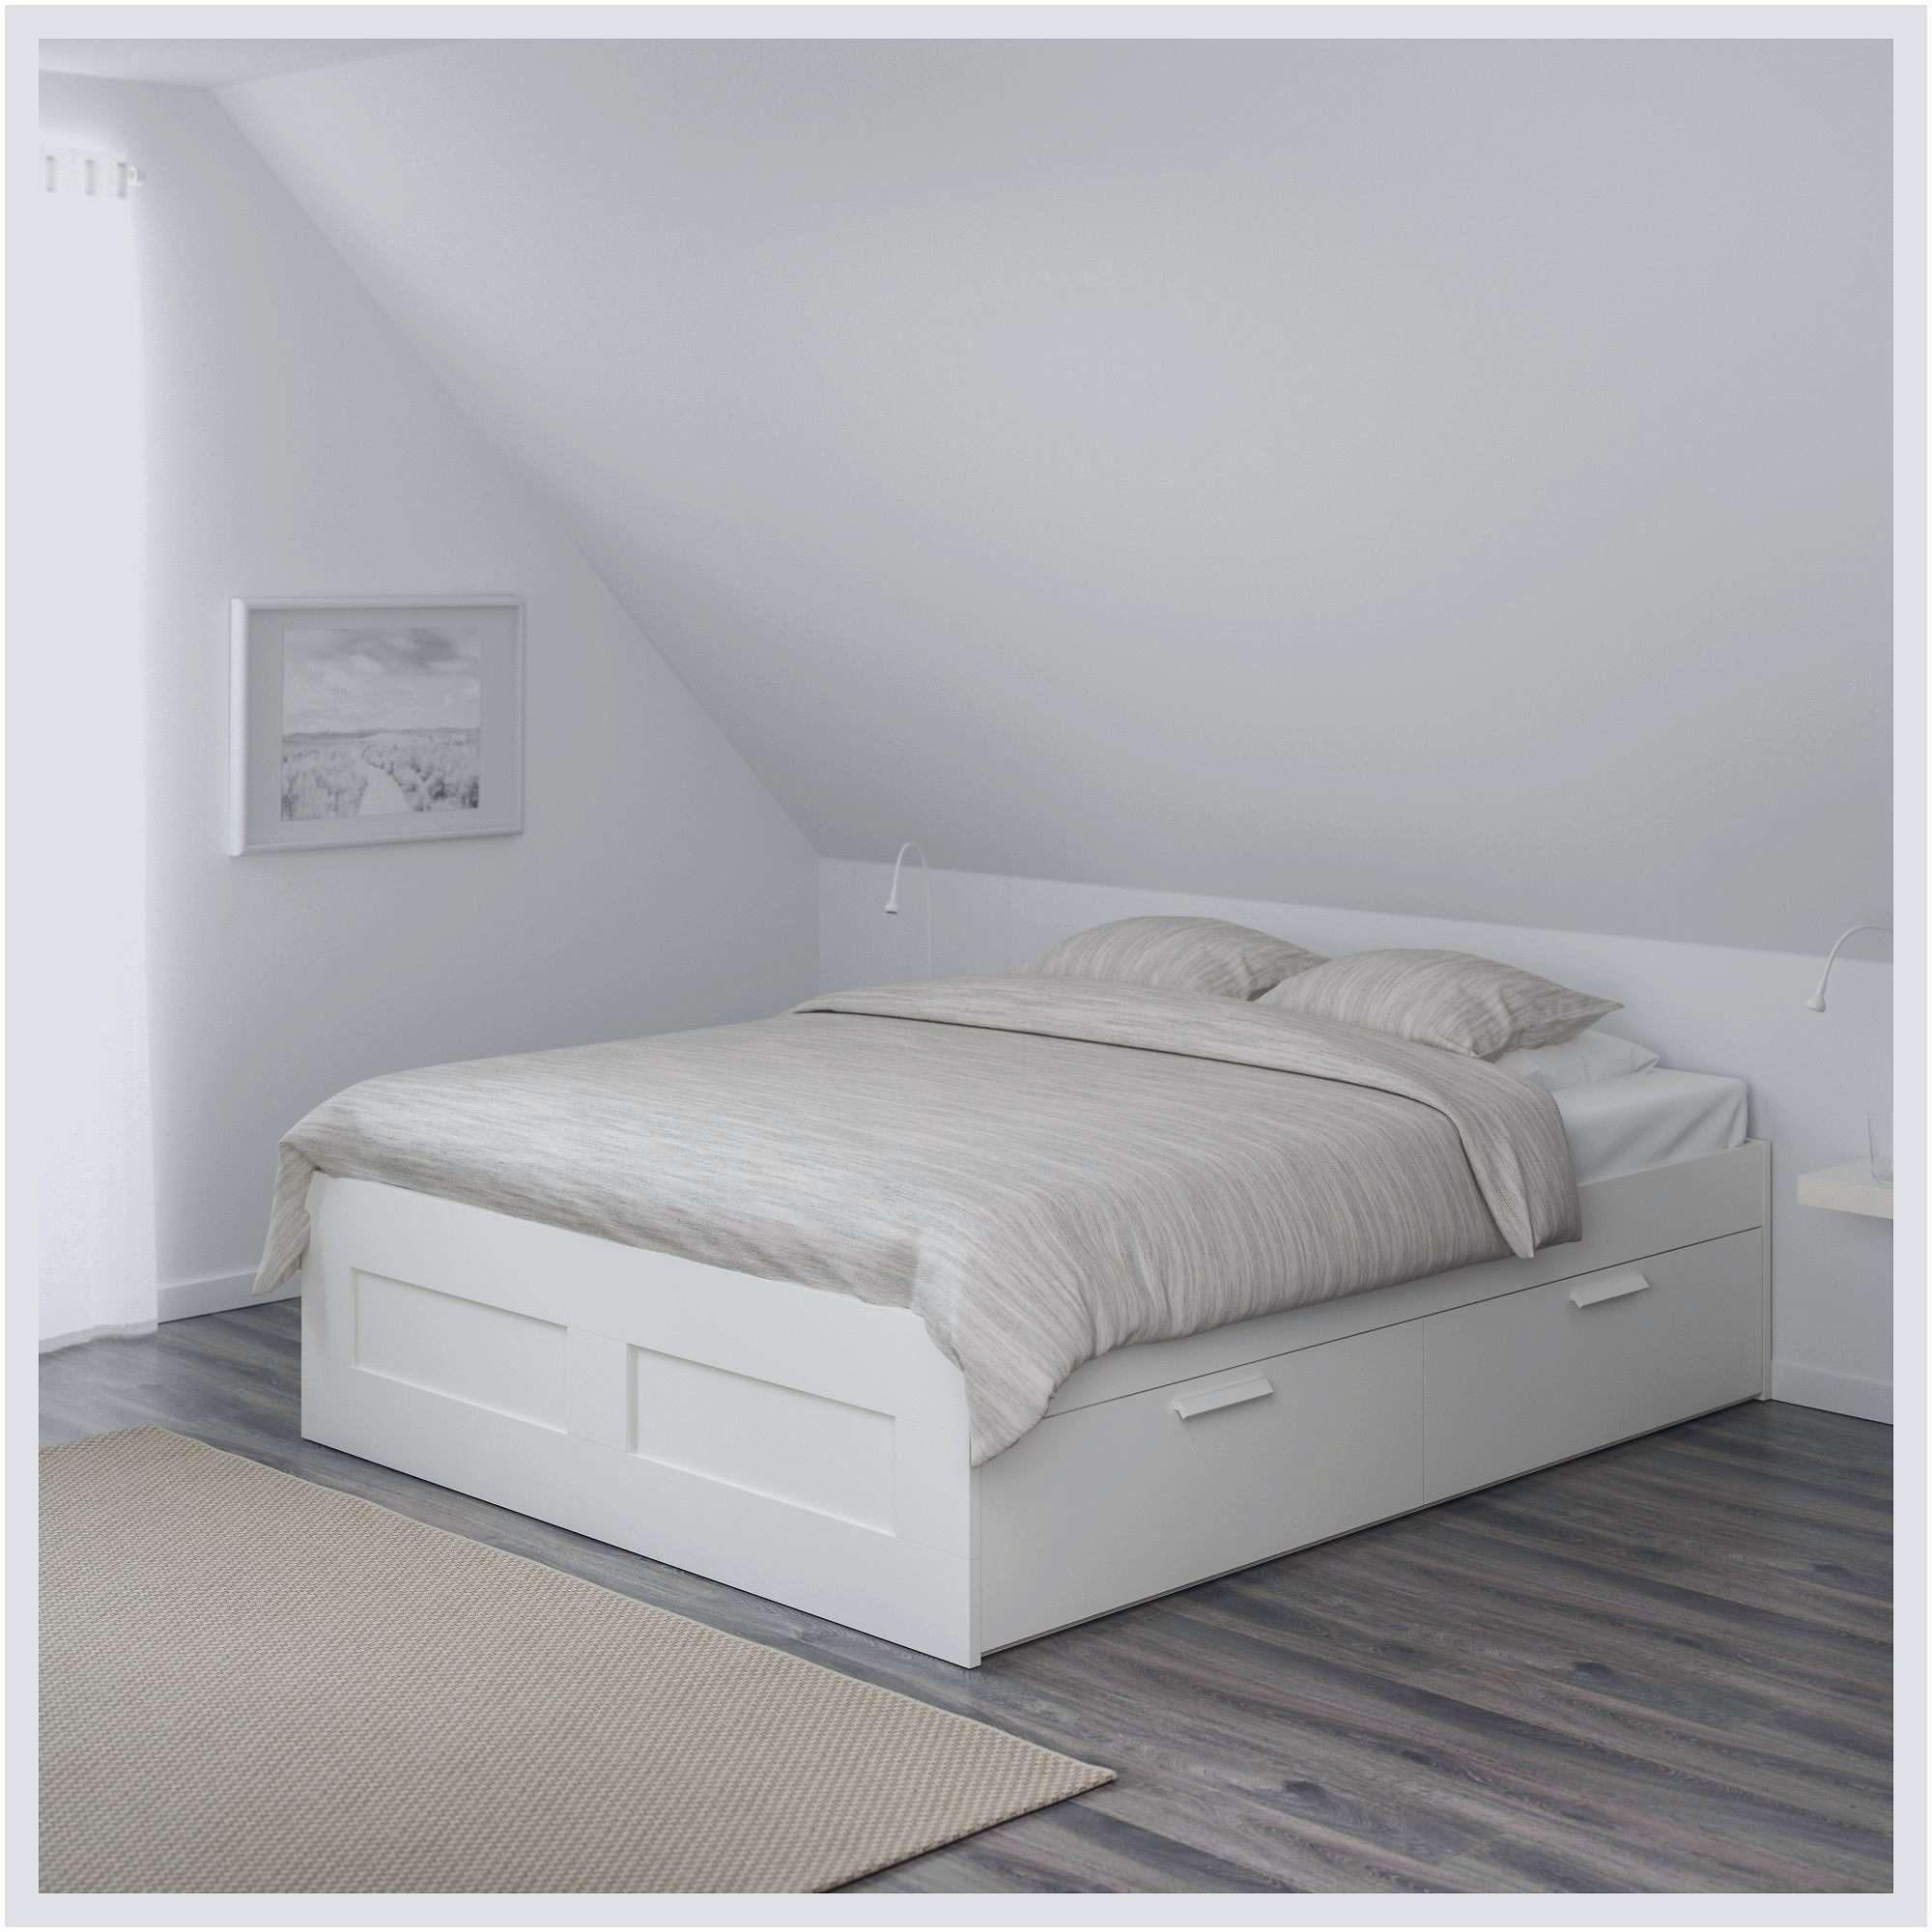 Lit 120×190 Pas Cher Magnifique Elégant Matras 120—200 Ikea Luxe Jugendbett 120—200 Ikea Frisch Lit